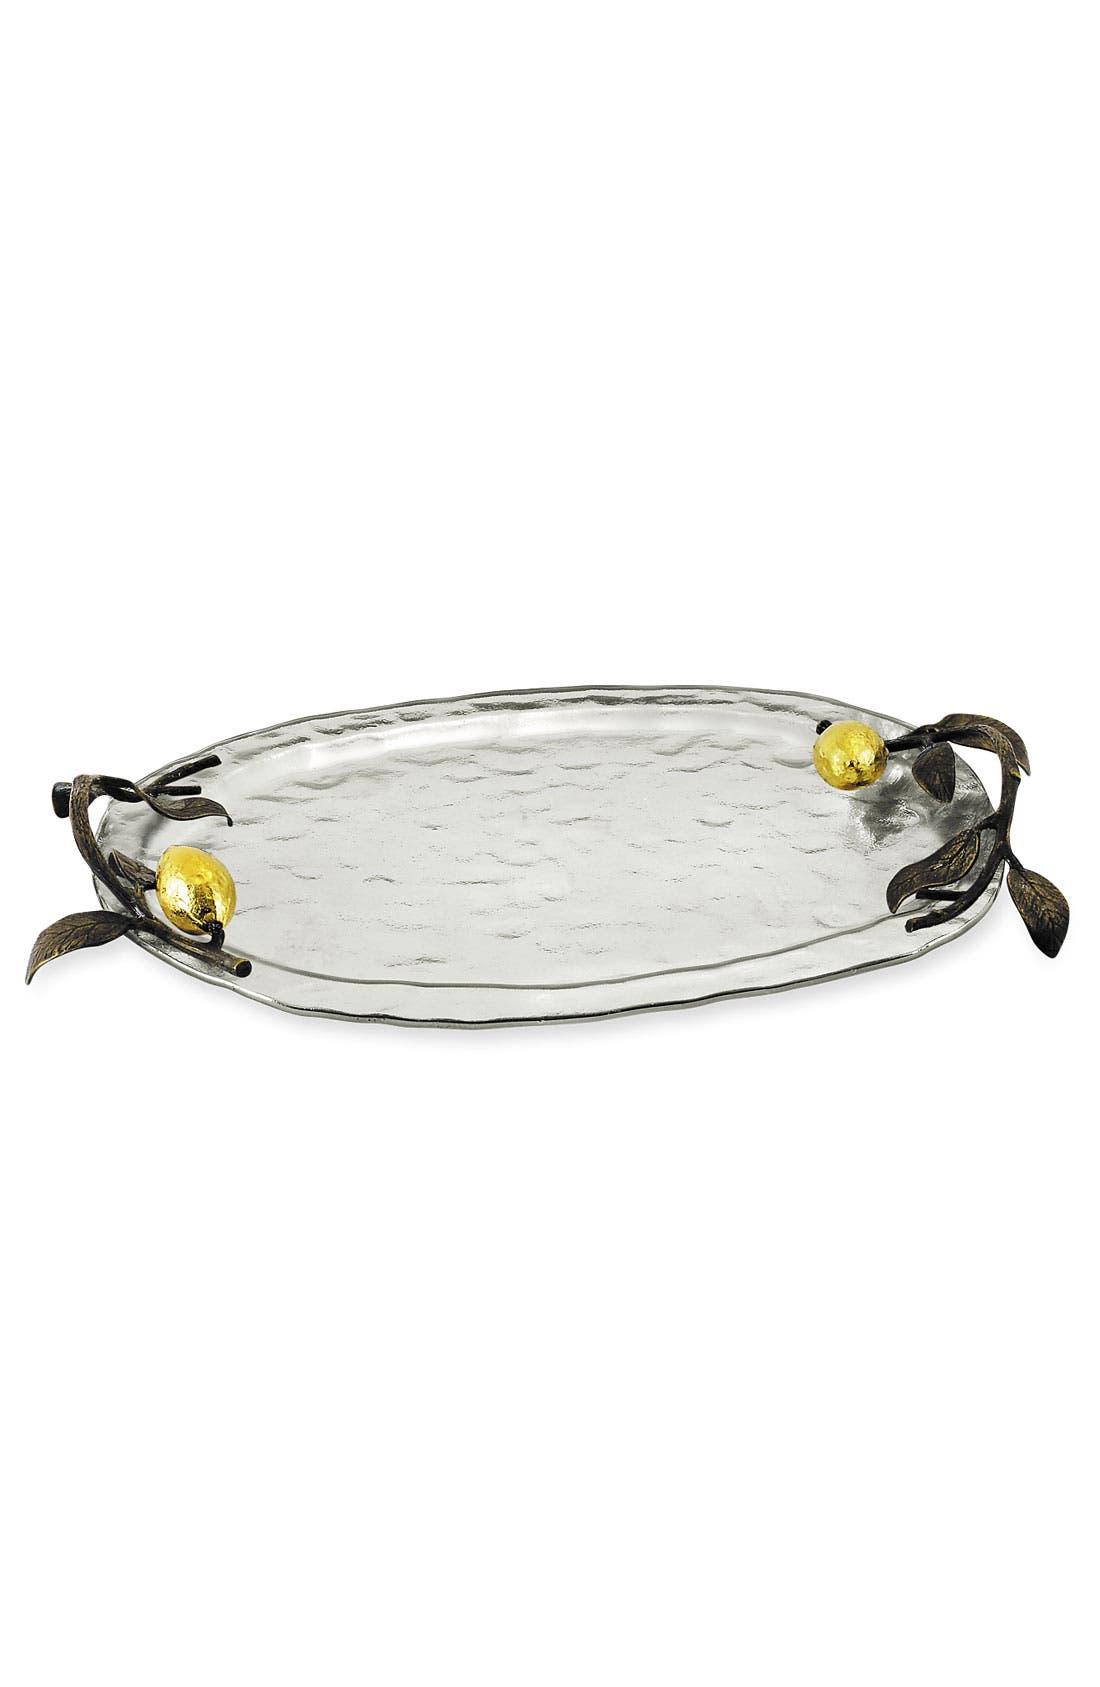 Alternate Image 1 Selected - Michael Aram 'Lemonwood' Plated Glass Tray